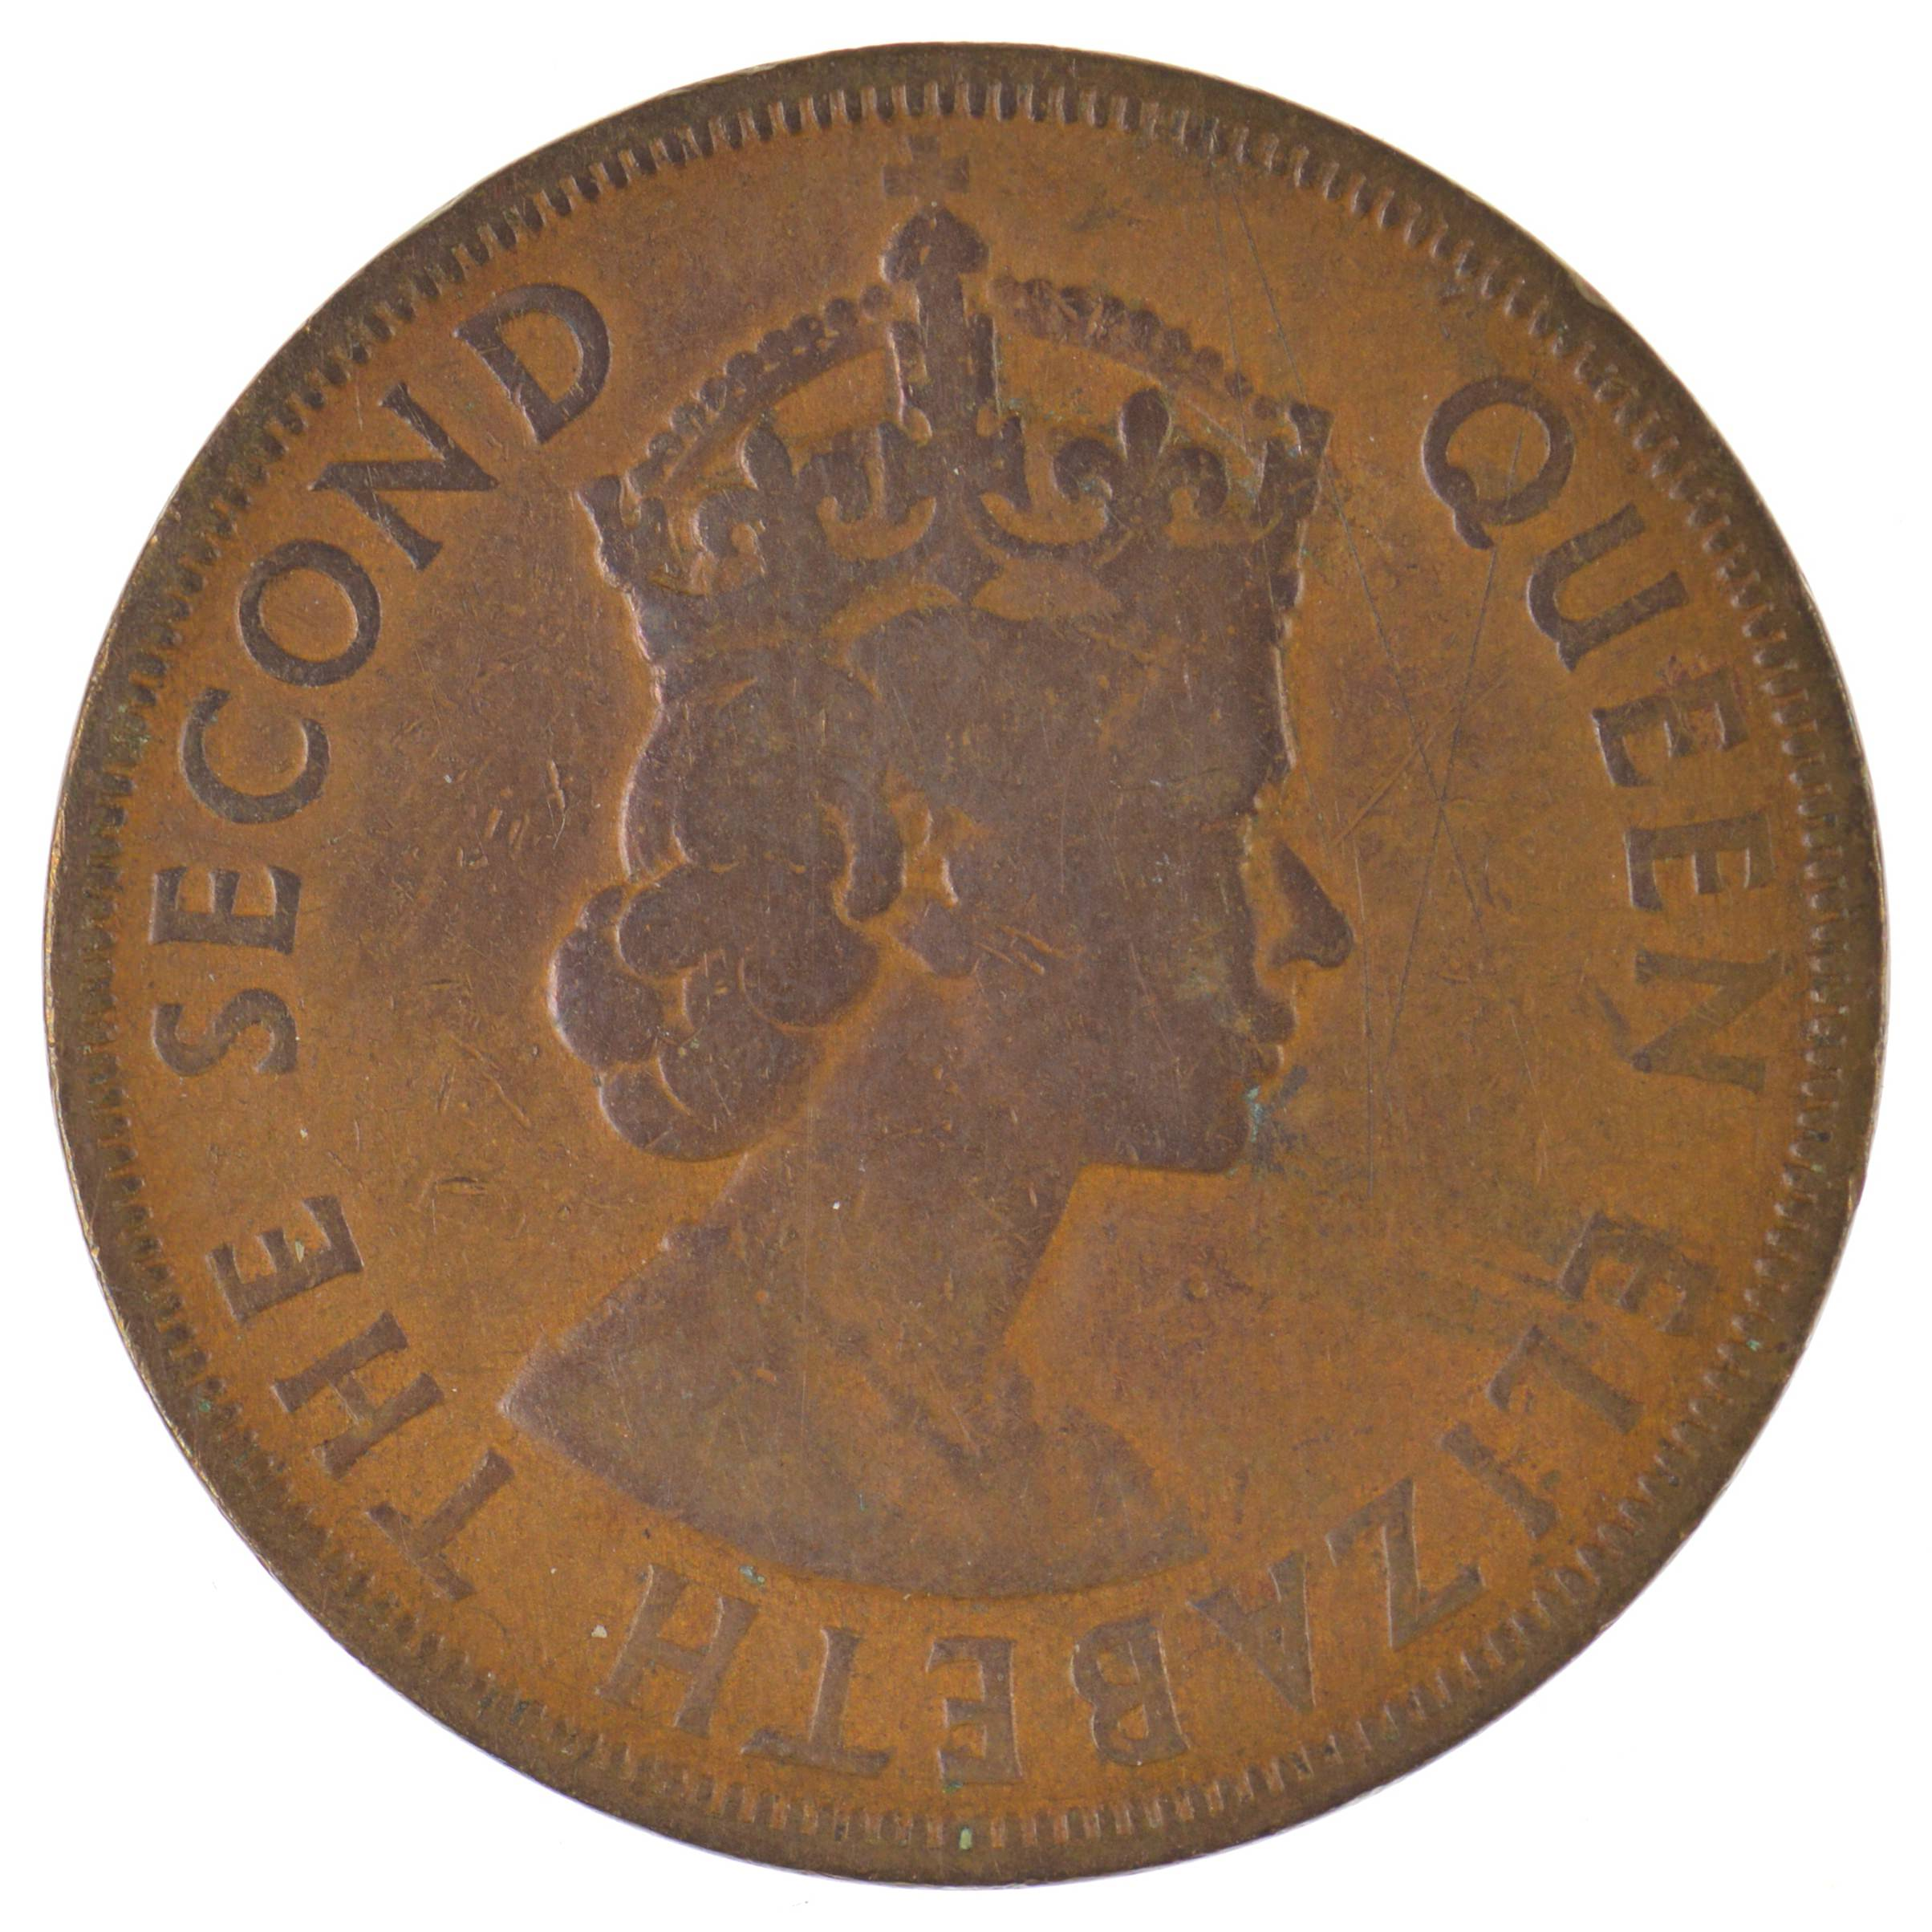 1955 British Caribbean Territories 2 Cents Queen Elizabeth